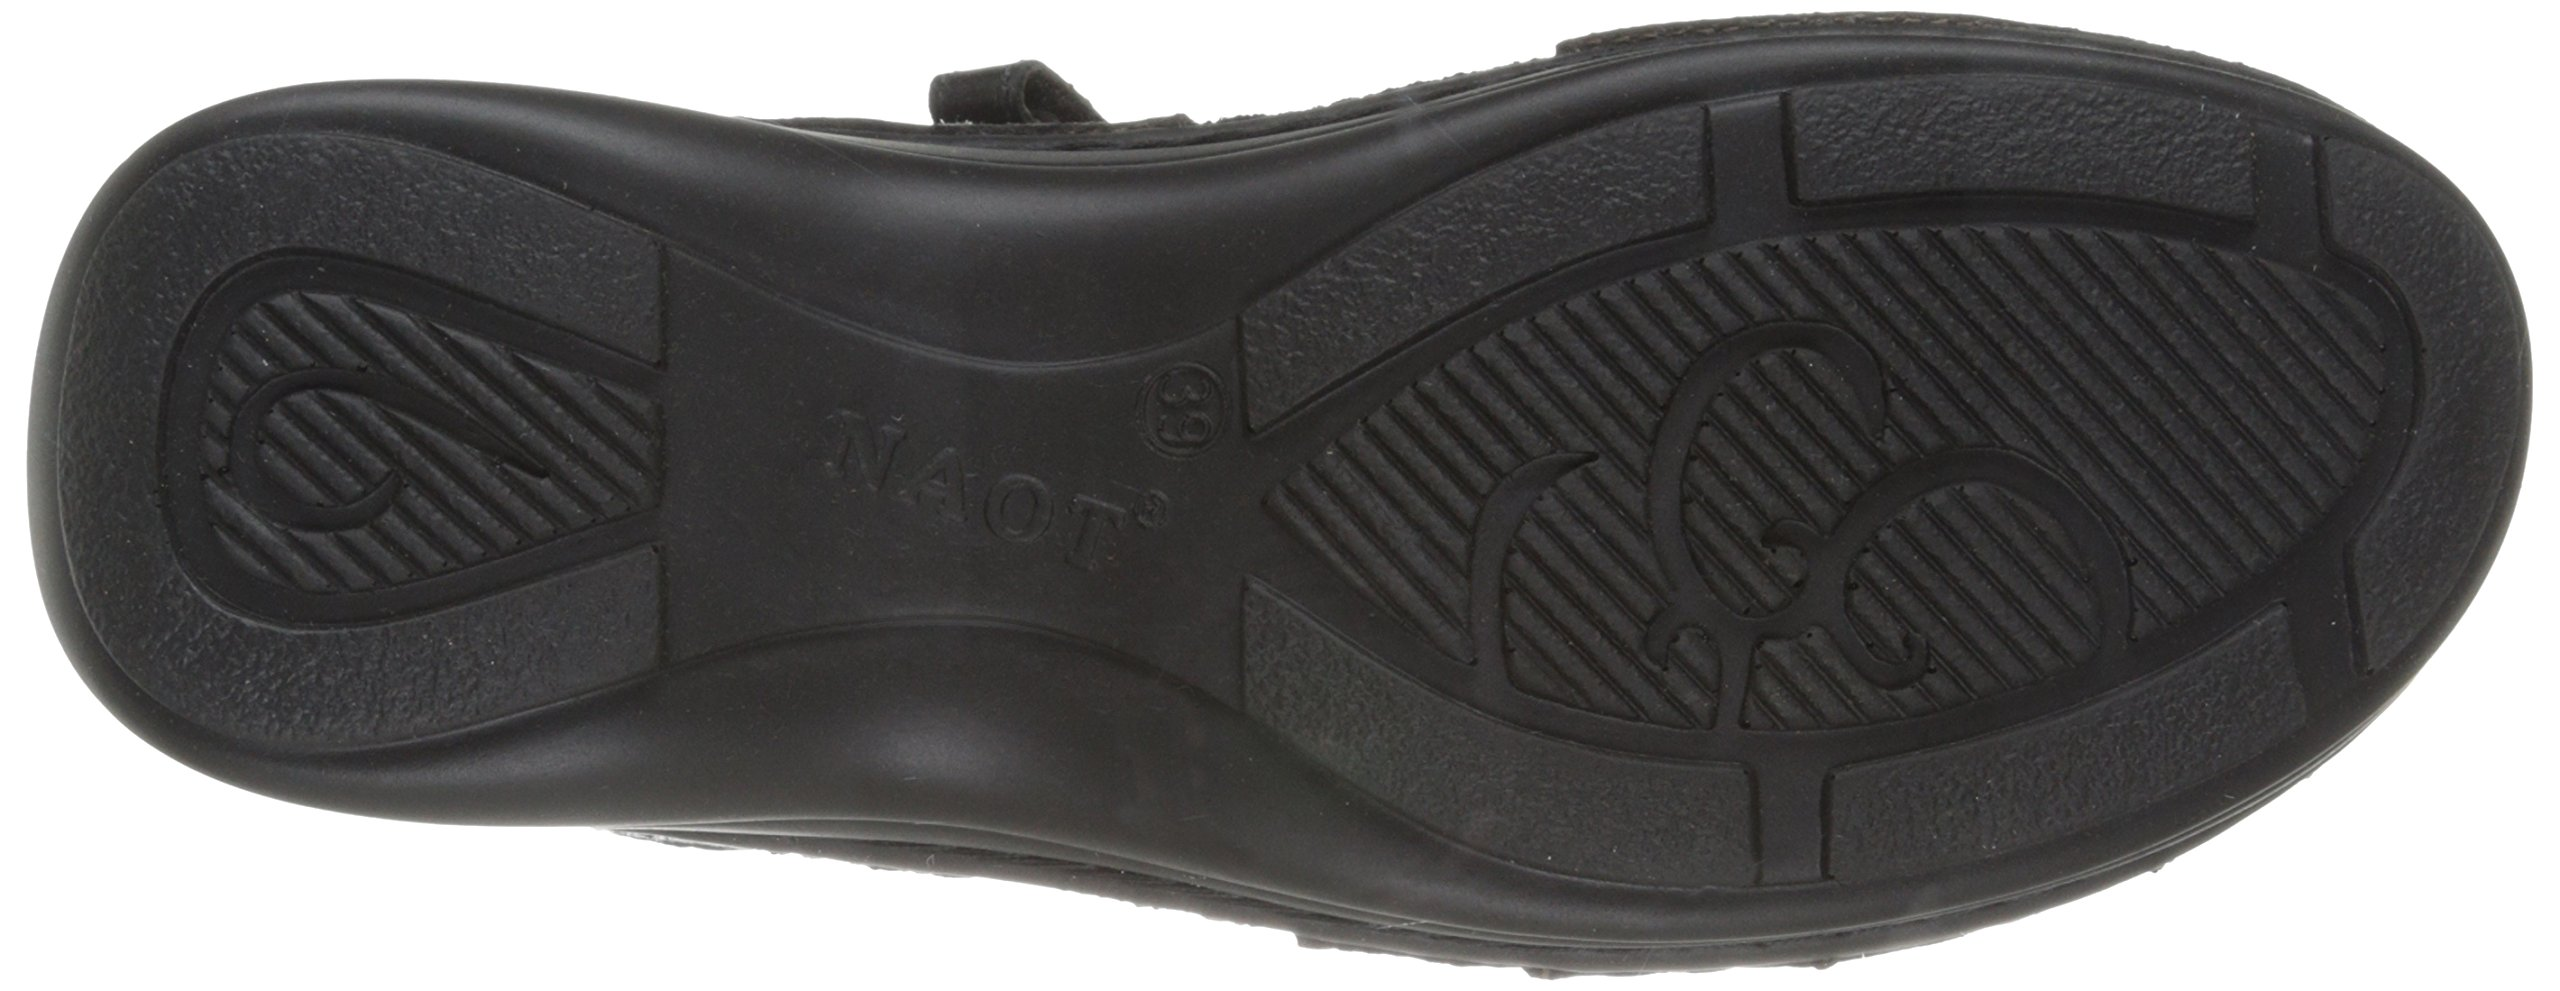 Naot Women's Papaya Flat,Black Madras Leather,40 EU/8.5-9 M US by NAOT (Image #3)